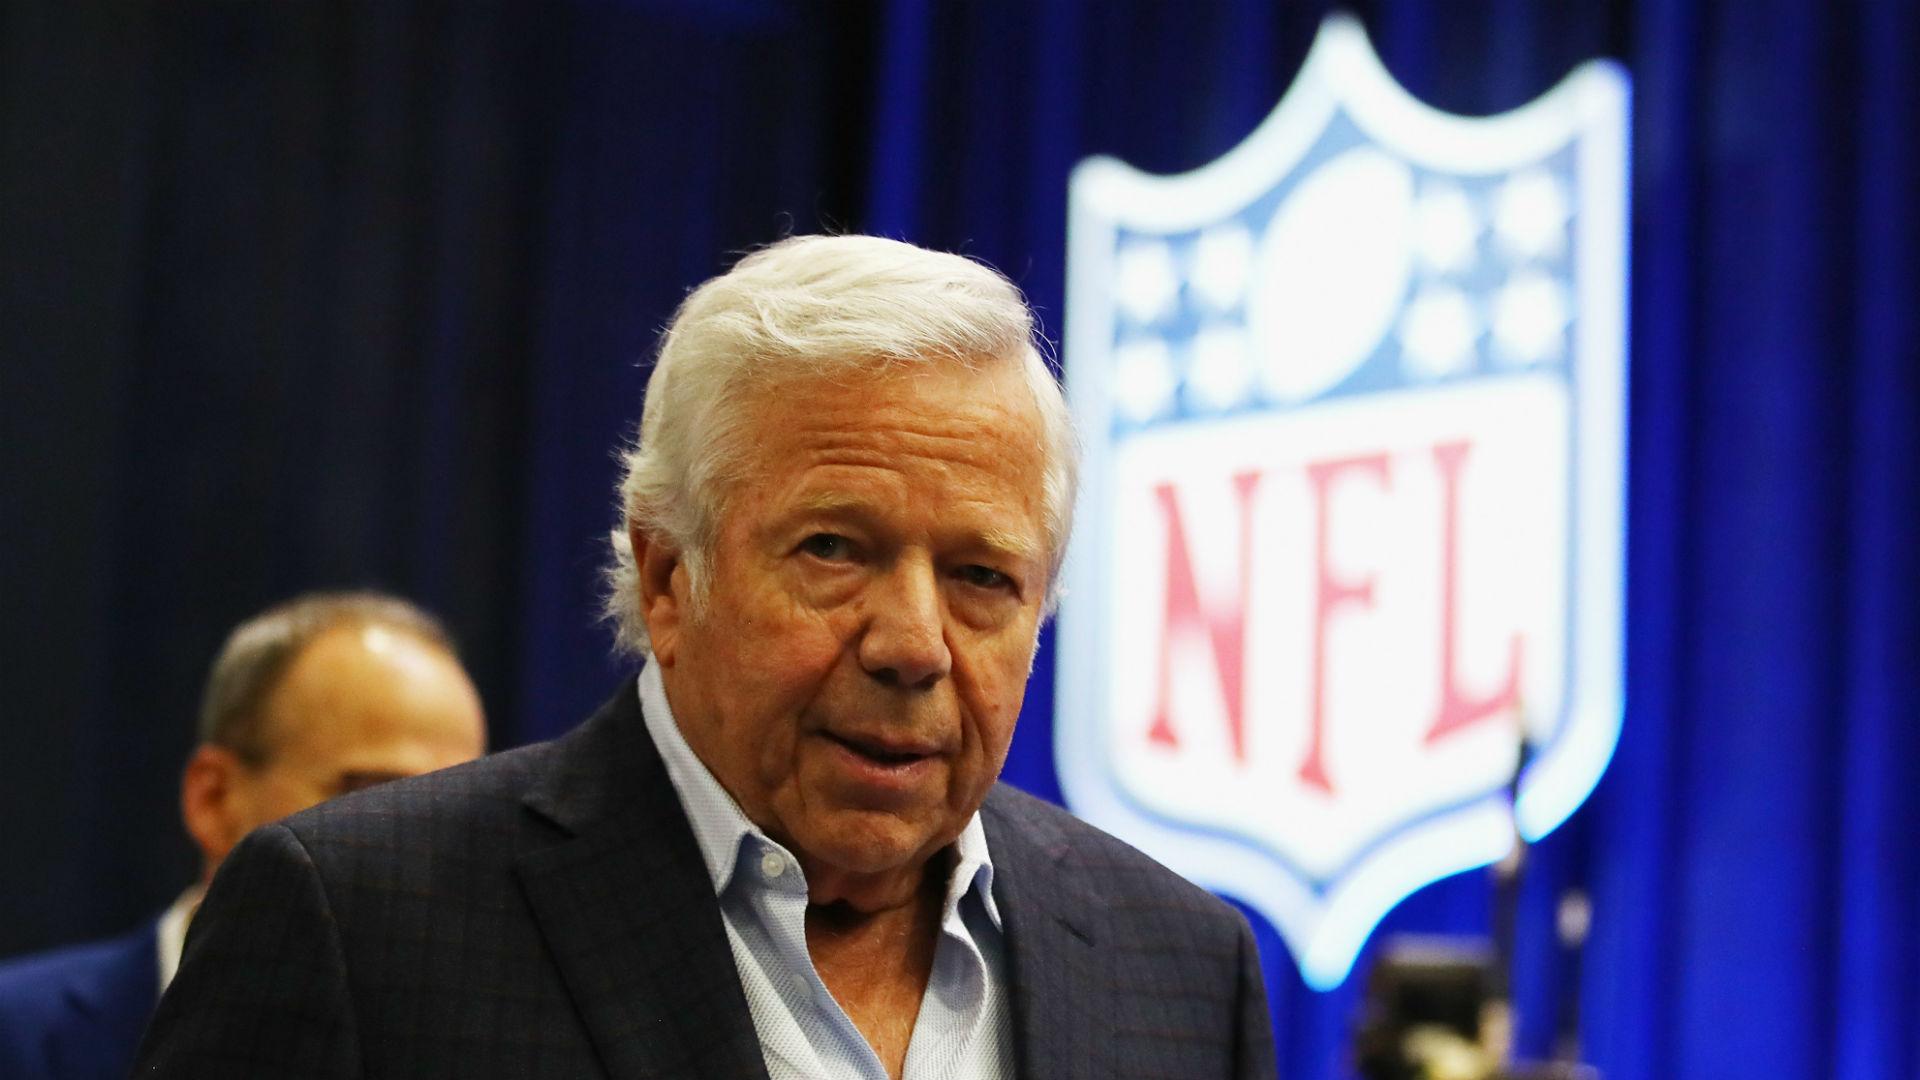 Patriots owner Robert Kraft breaks silence: 'I am truly sorry'